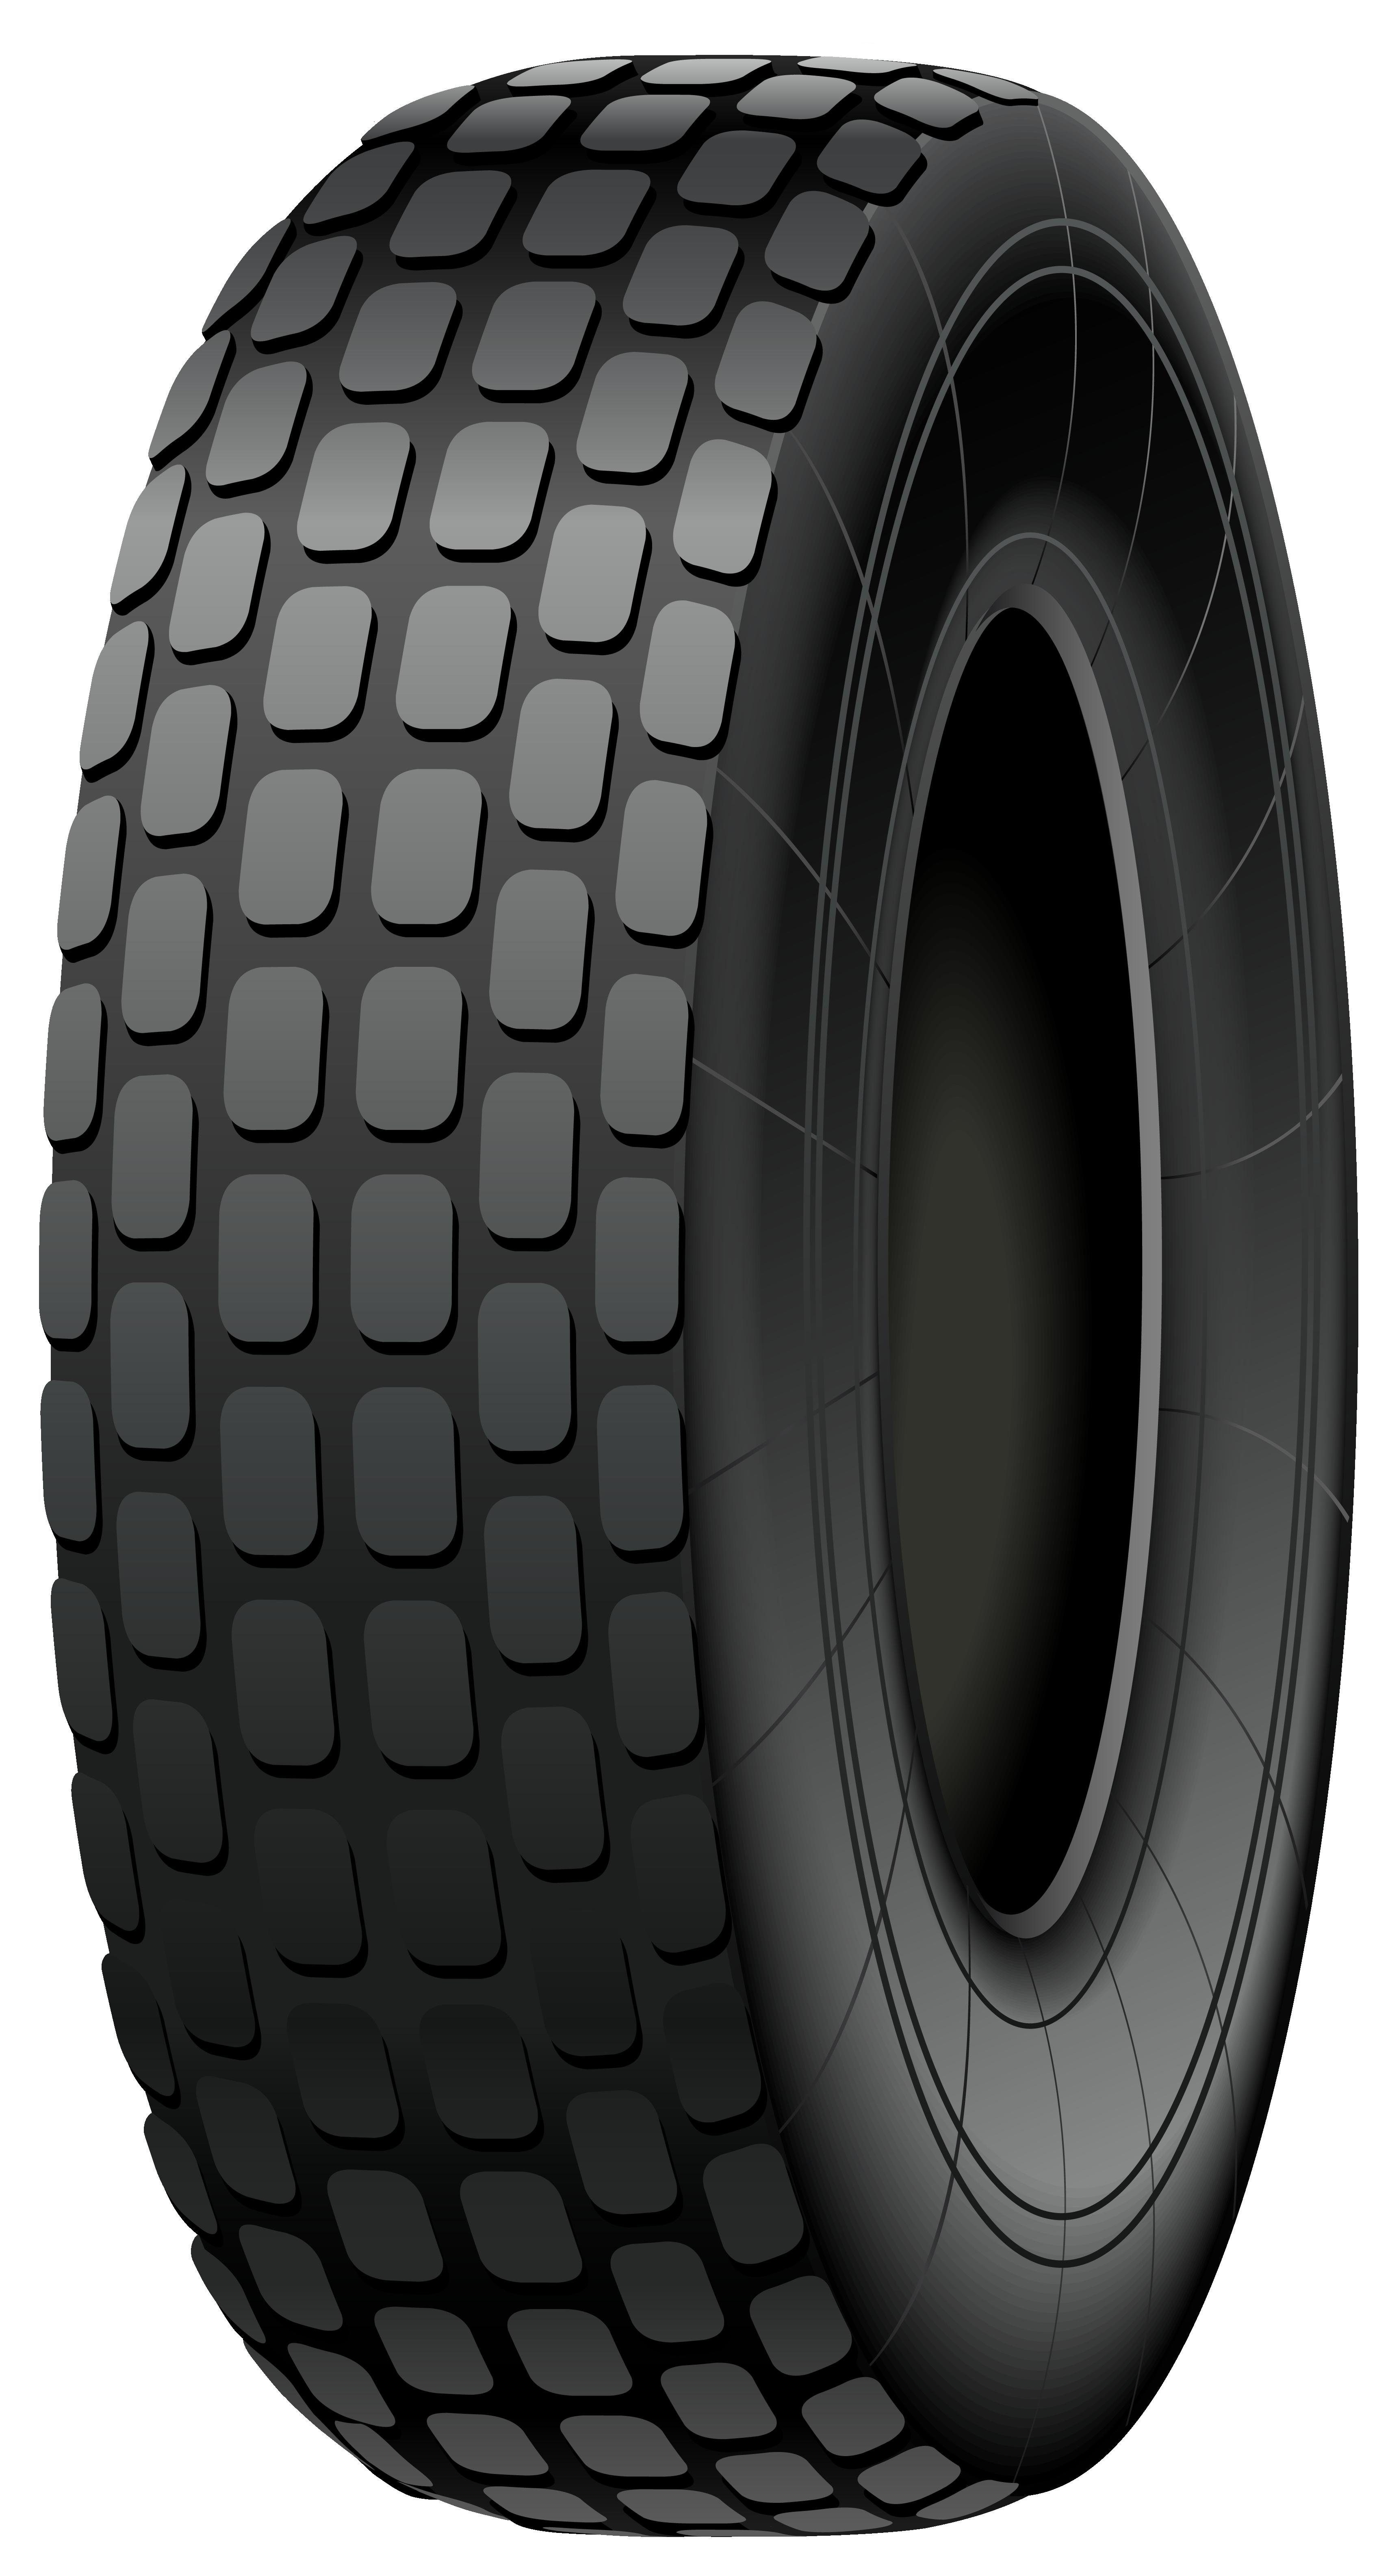 Wheel clipart spare tire. Black png clip art